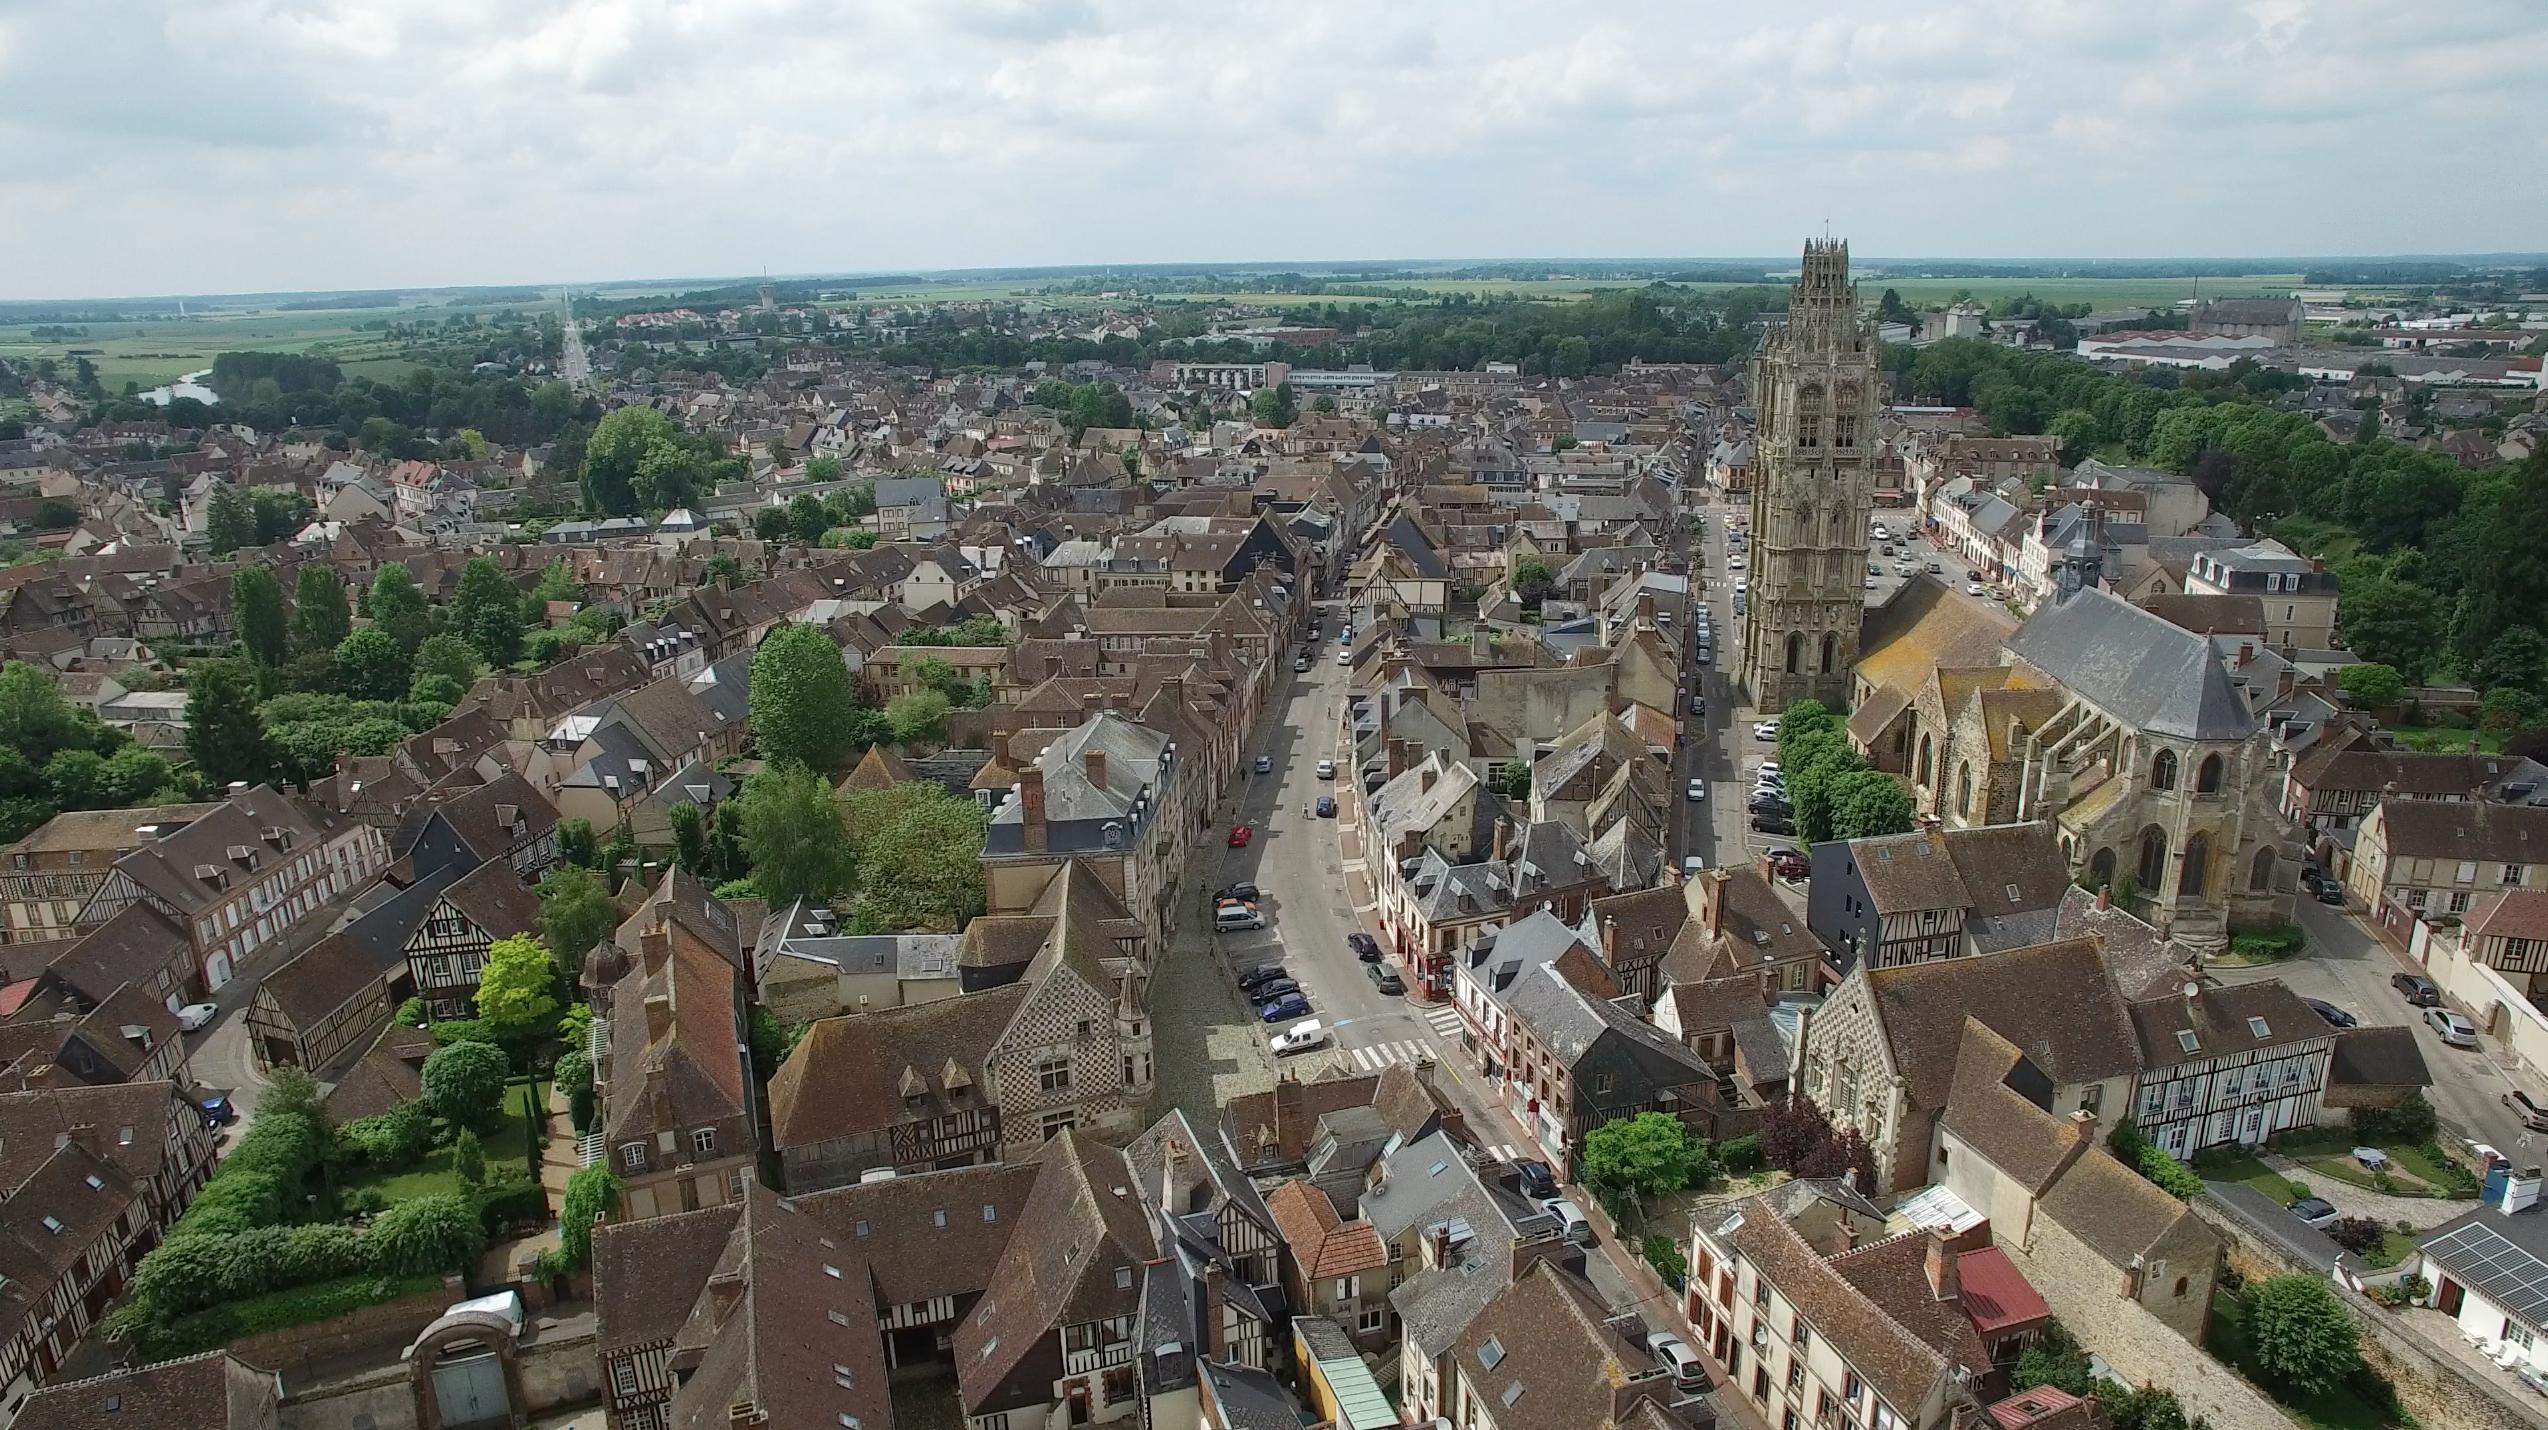 Verneuil-d'Avre-et-d'Iton